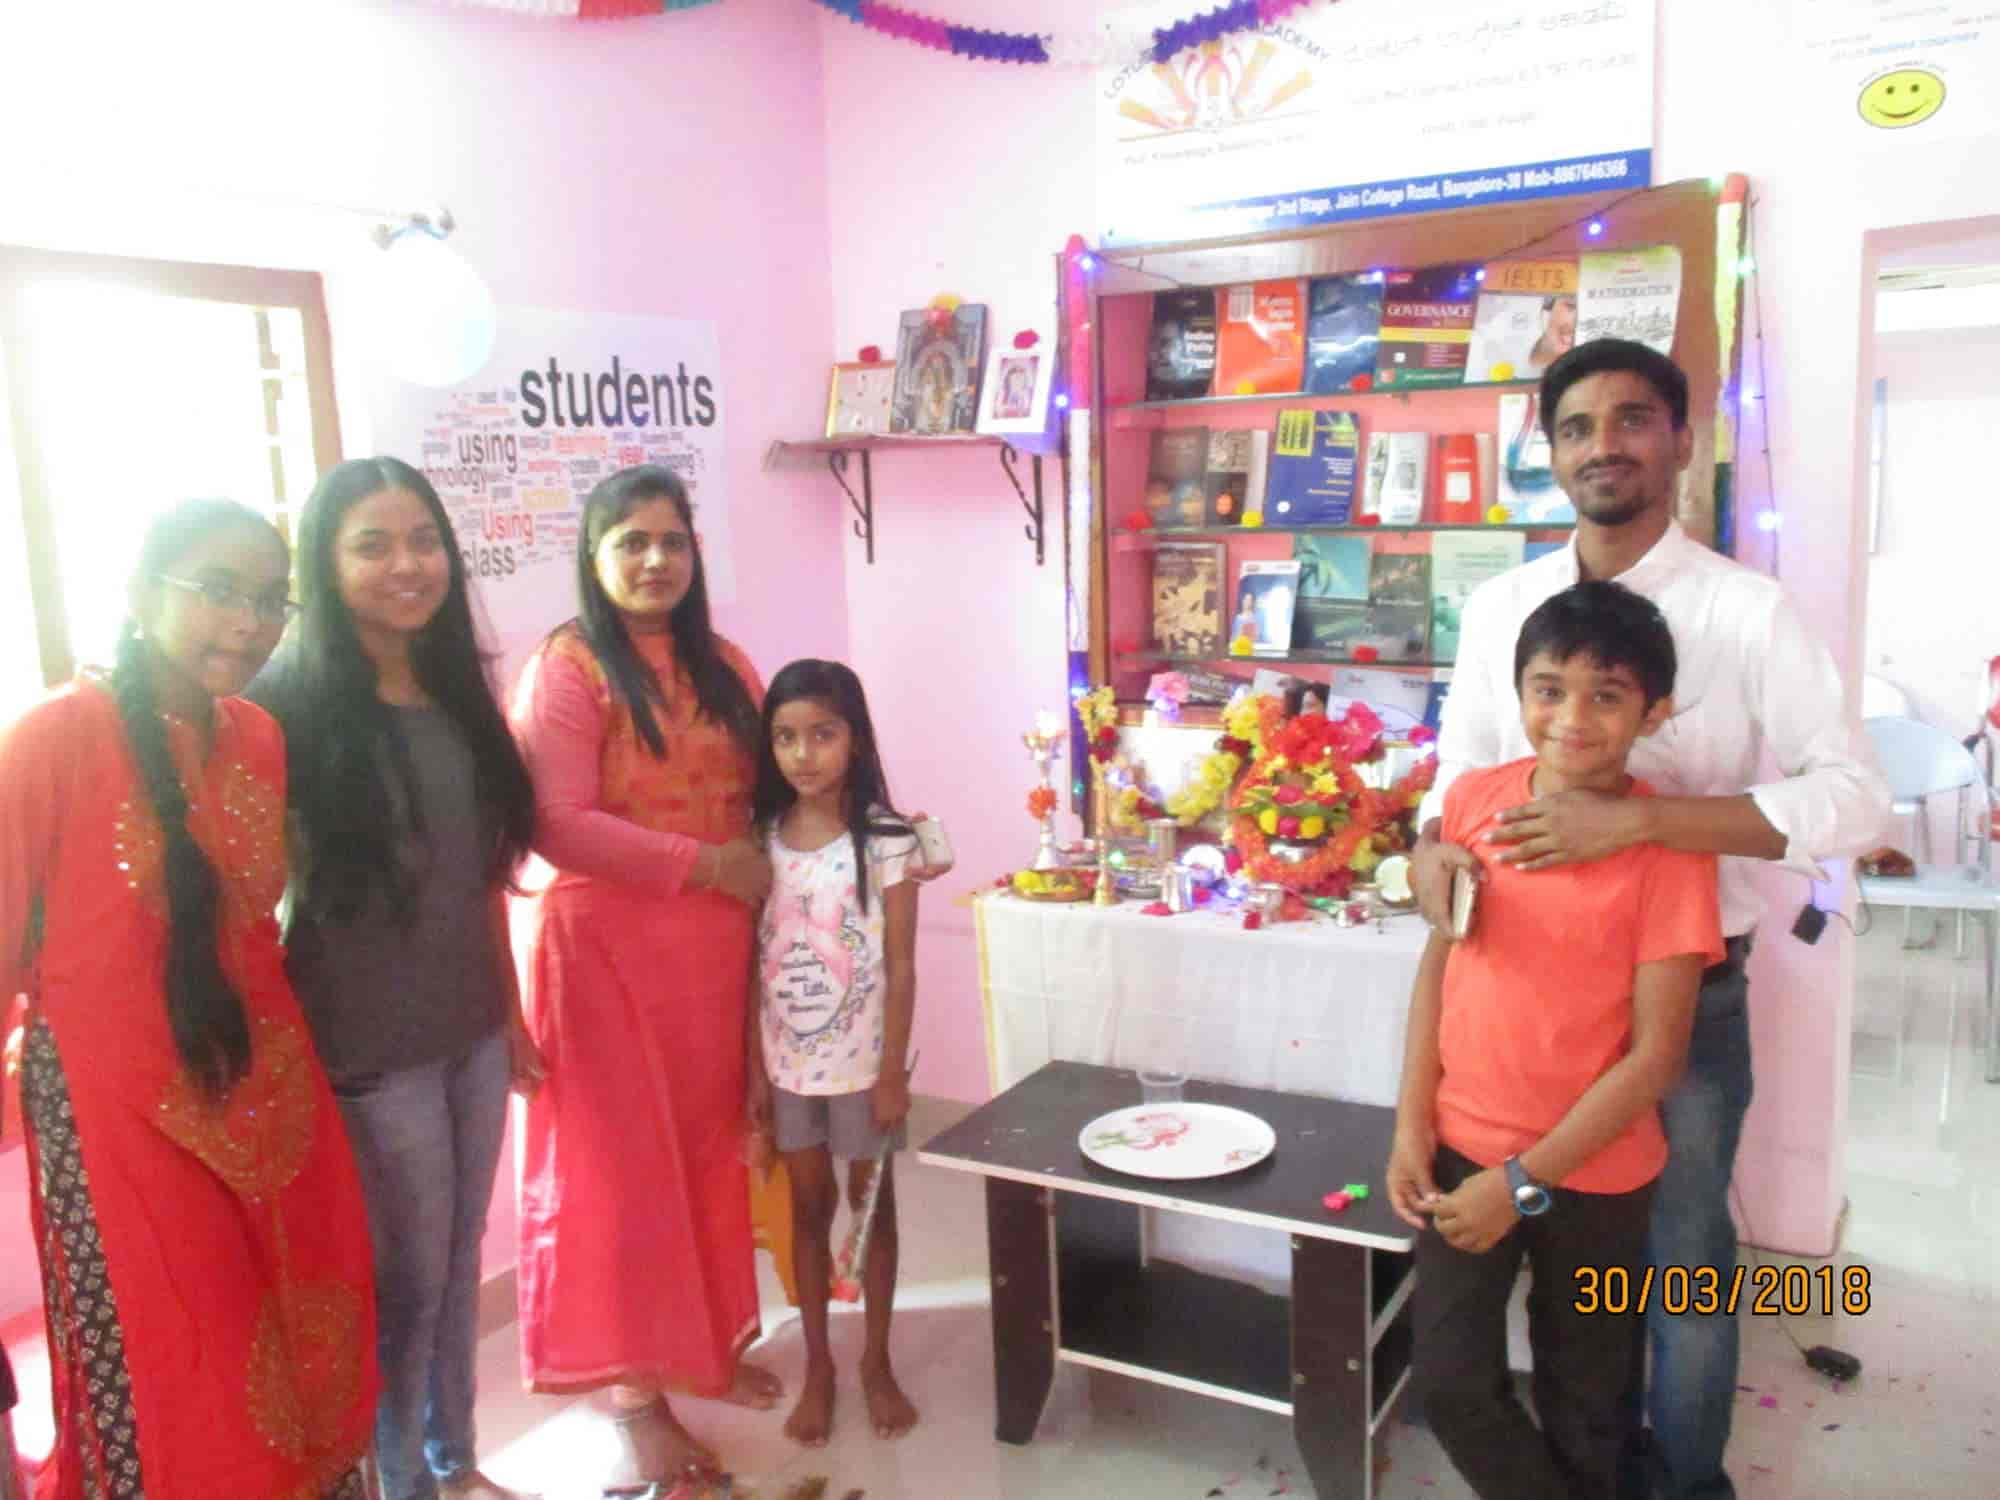 Lotus Language Academy Indiranagar Language Classes For English Conversation In Bangalore Justdial